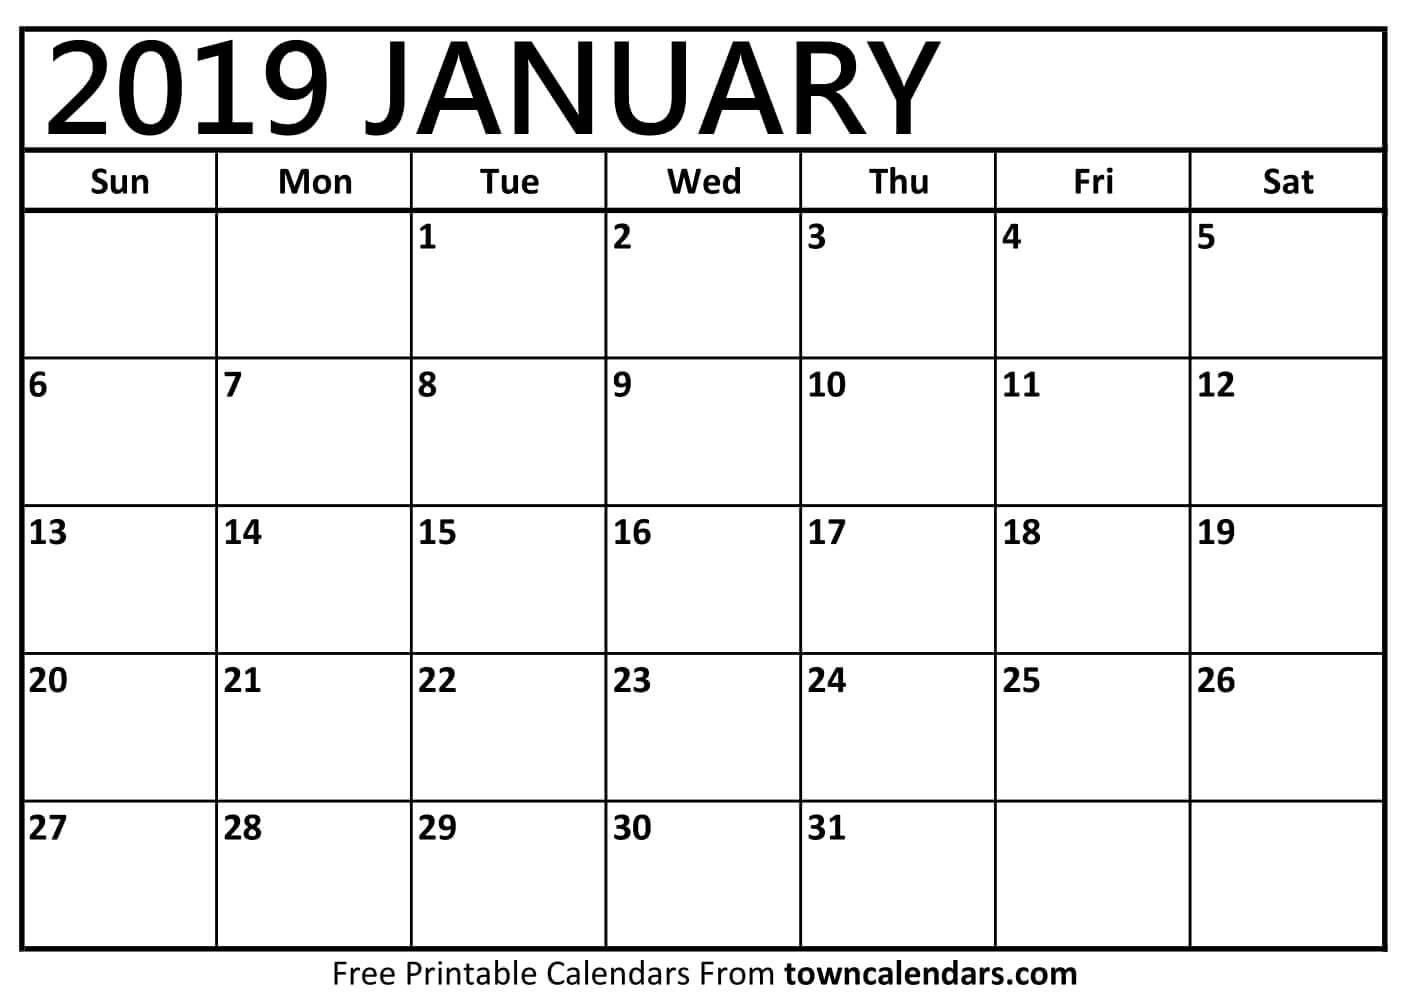 January 2019 Printable Calendar Pdf Free Monthly Template Calendar 2019 Printable January